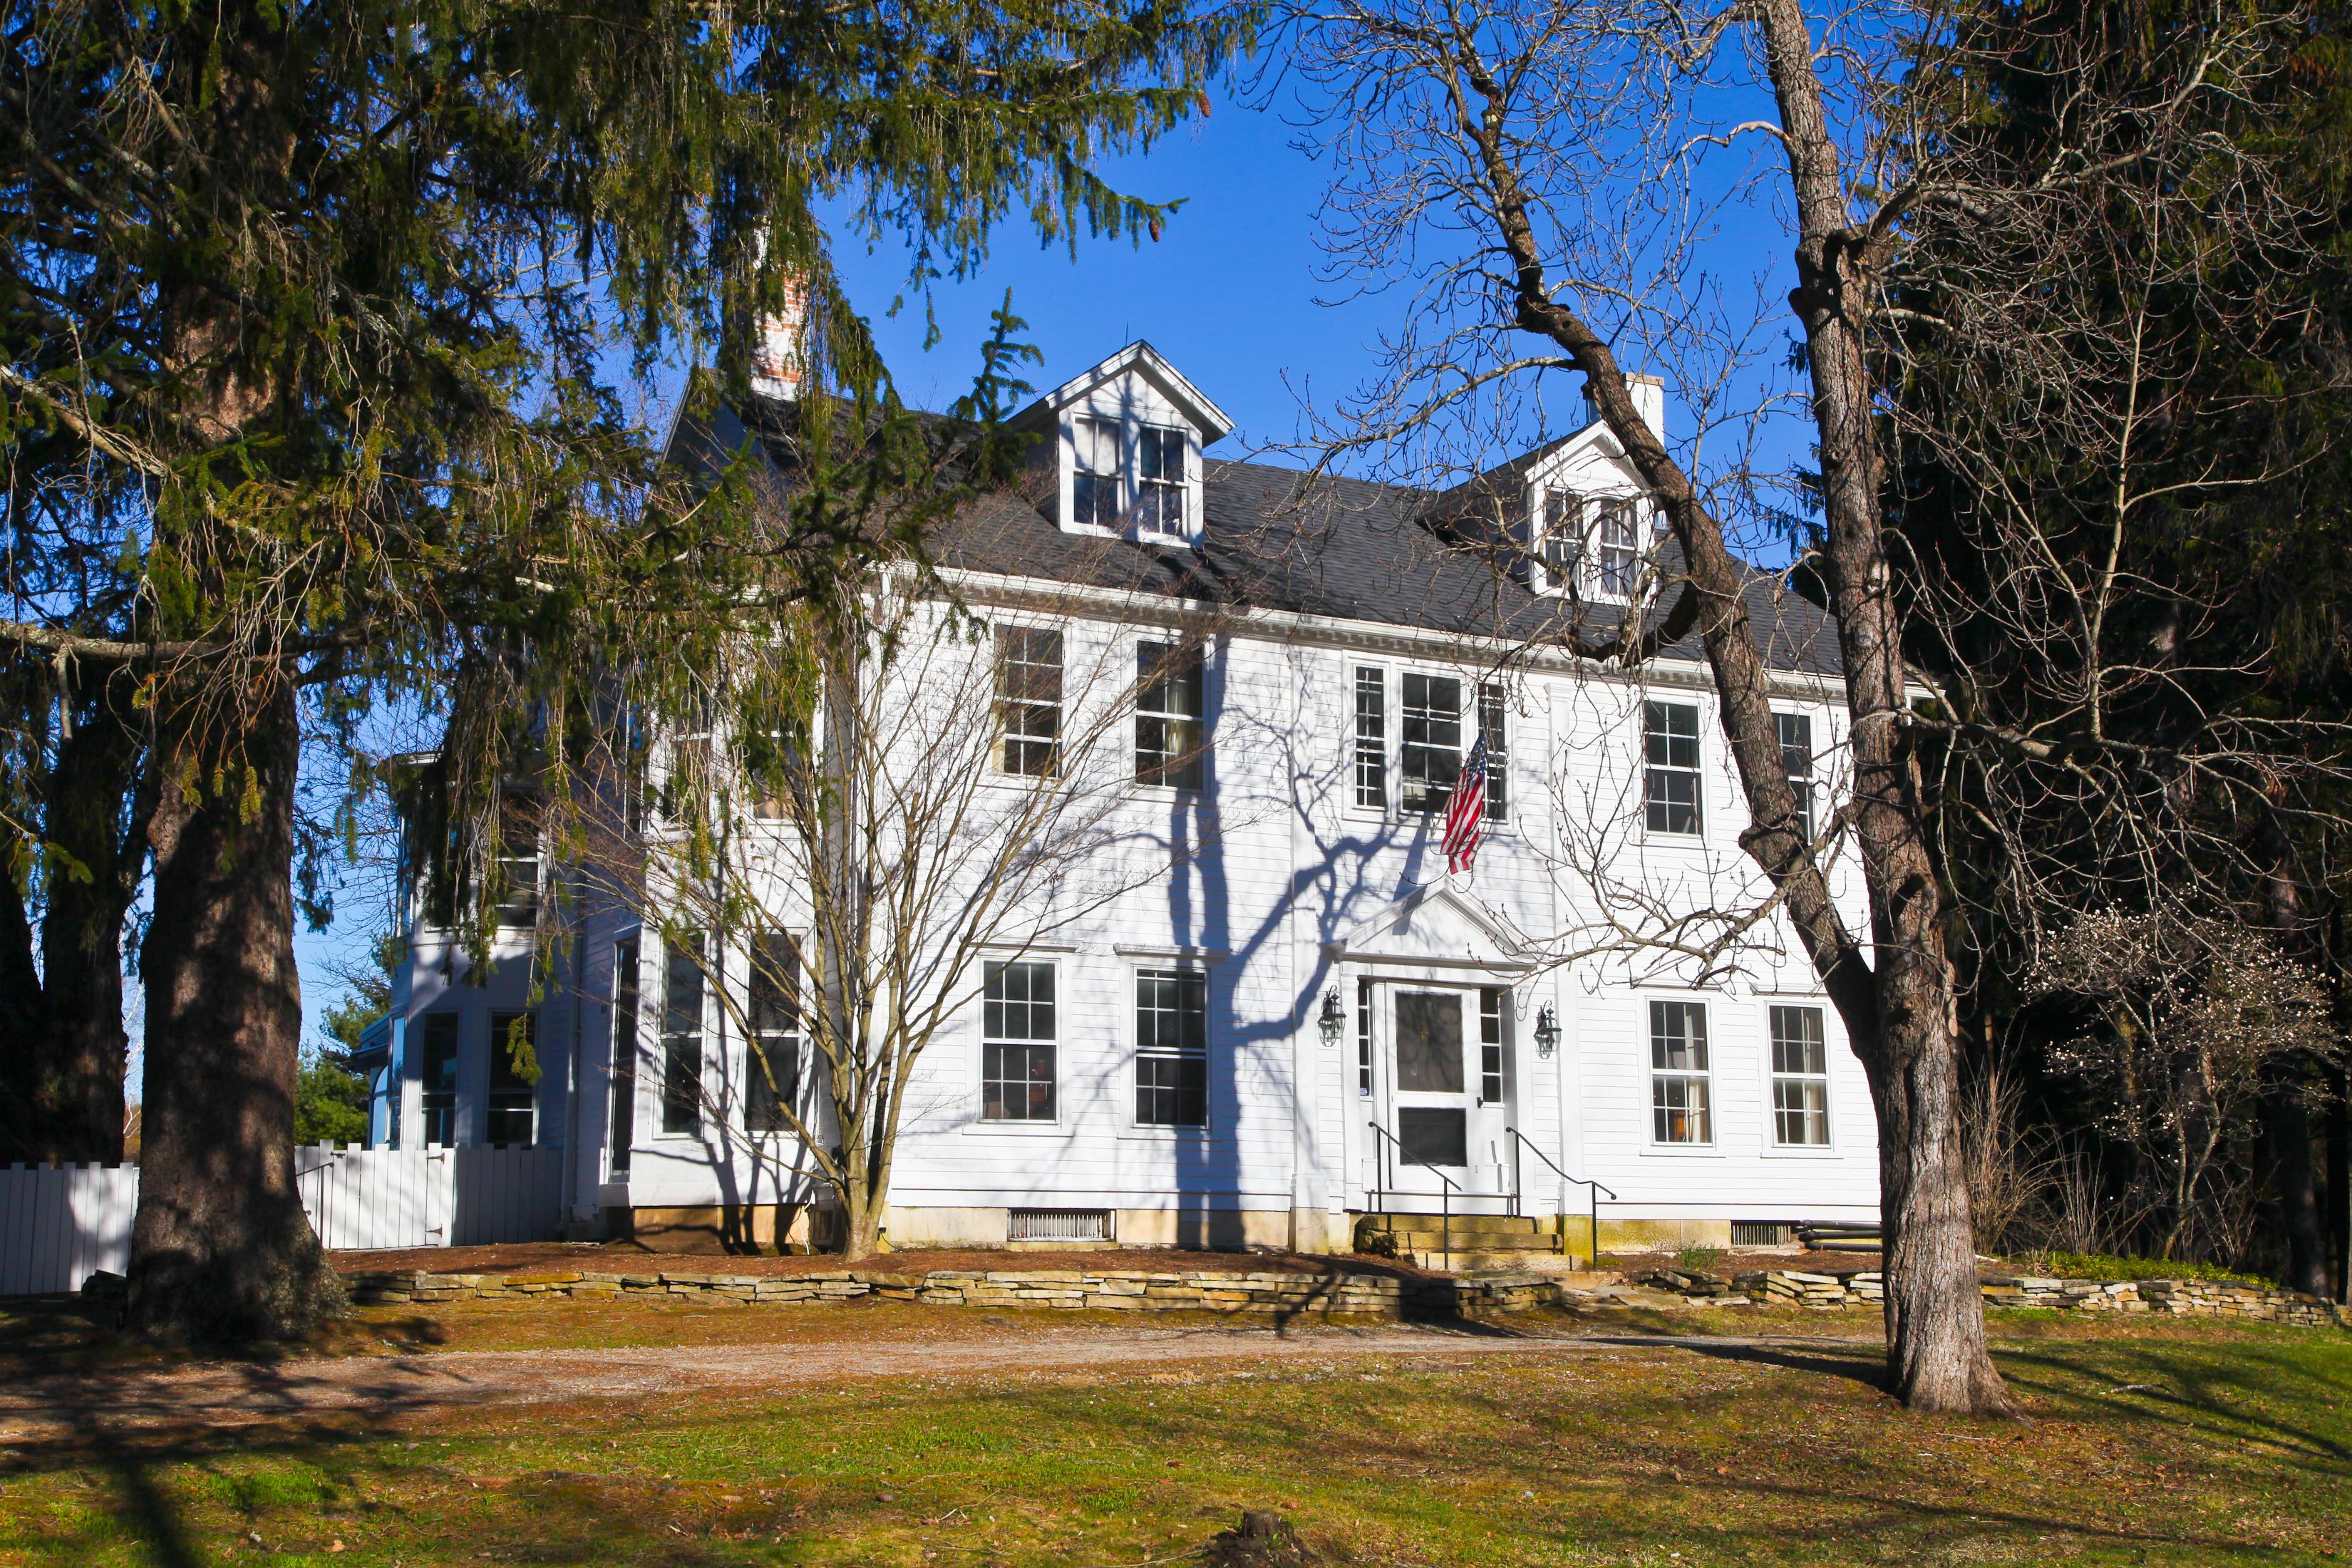 独户住宅 为 销售 在 Historic Splendor & Breathtaking Mountain Views 29 Prospect Hill Rd 克布里奇, 马萨诸塞州 01262 美国